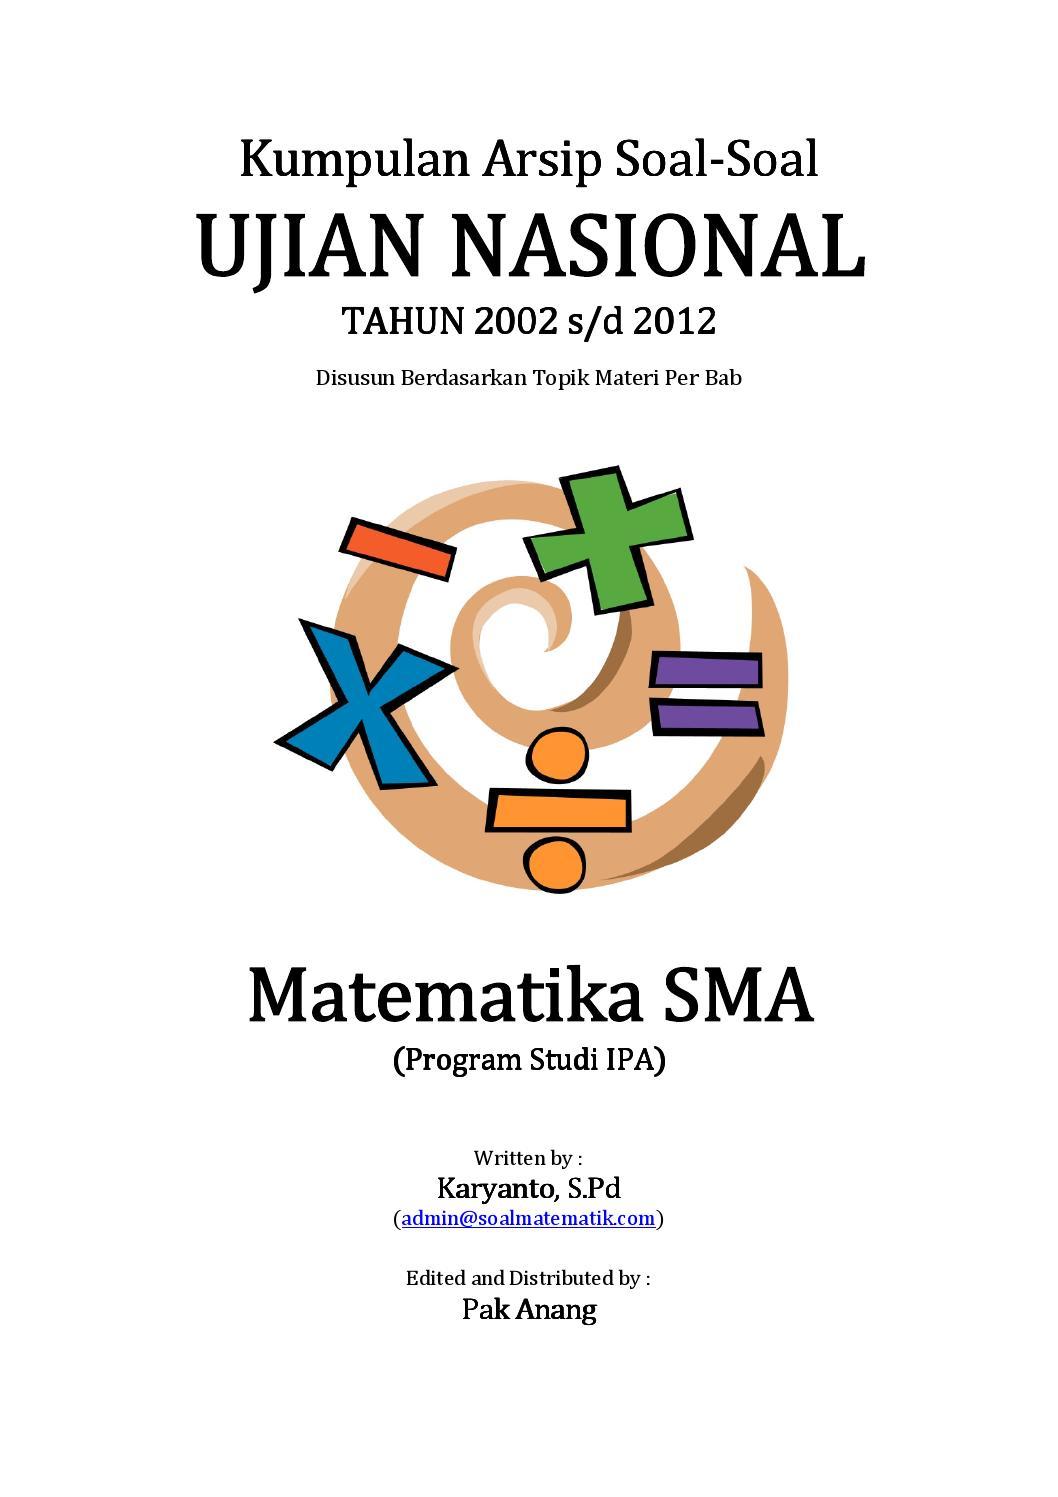 Kumpulan Arsip Soal Un Matematika Sma Program Ipa Tahun 2002 2012 Per Bab By Miarsi Issuu